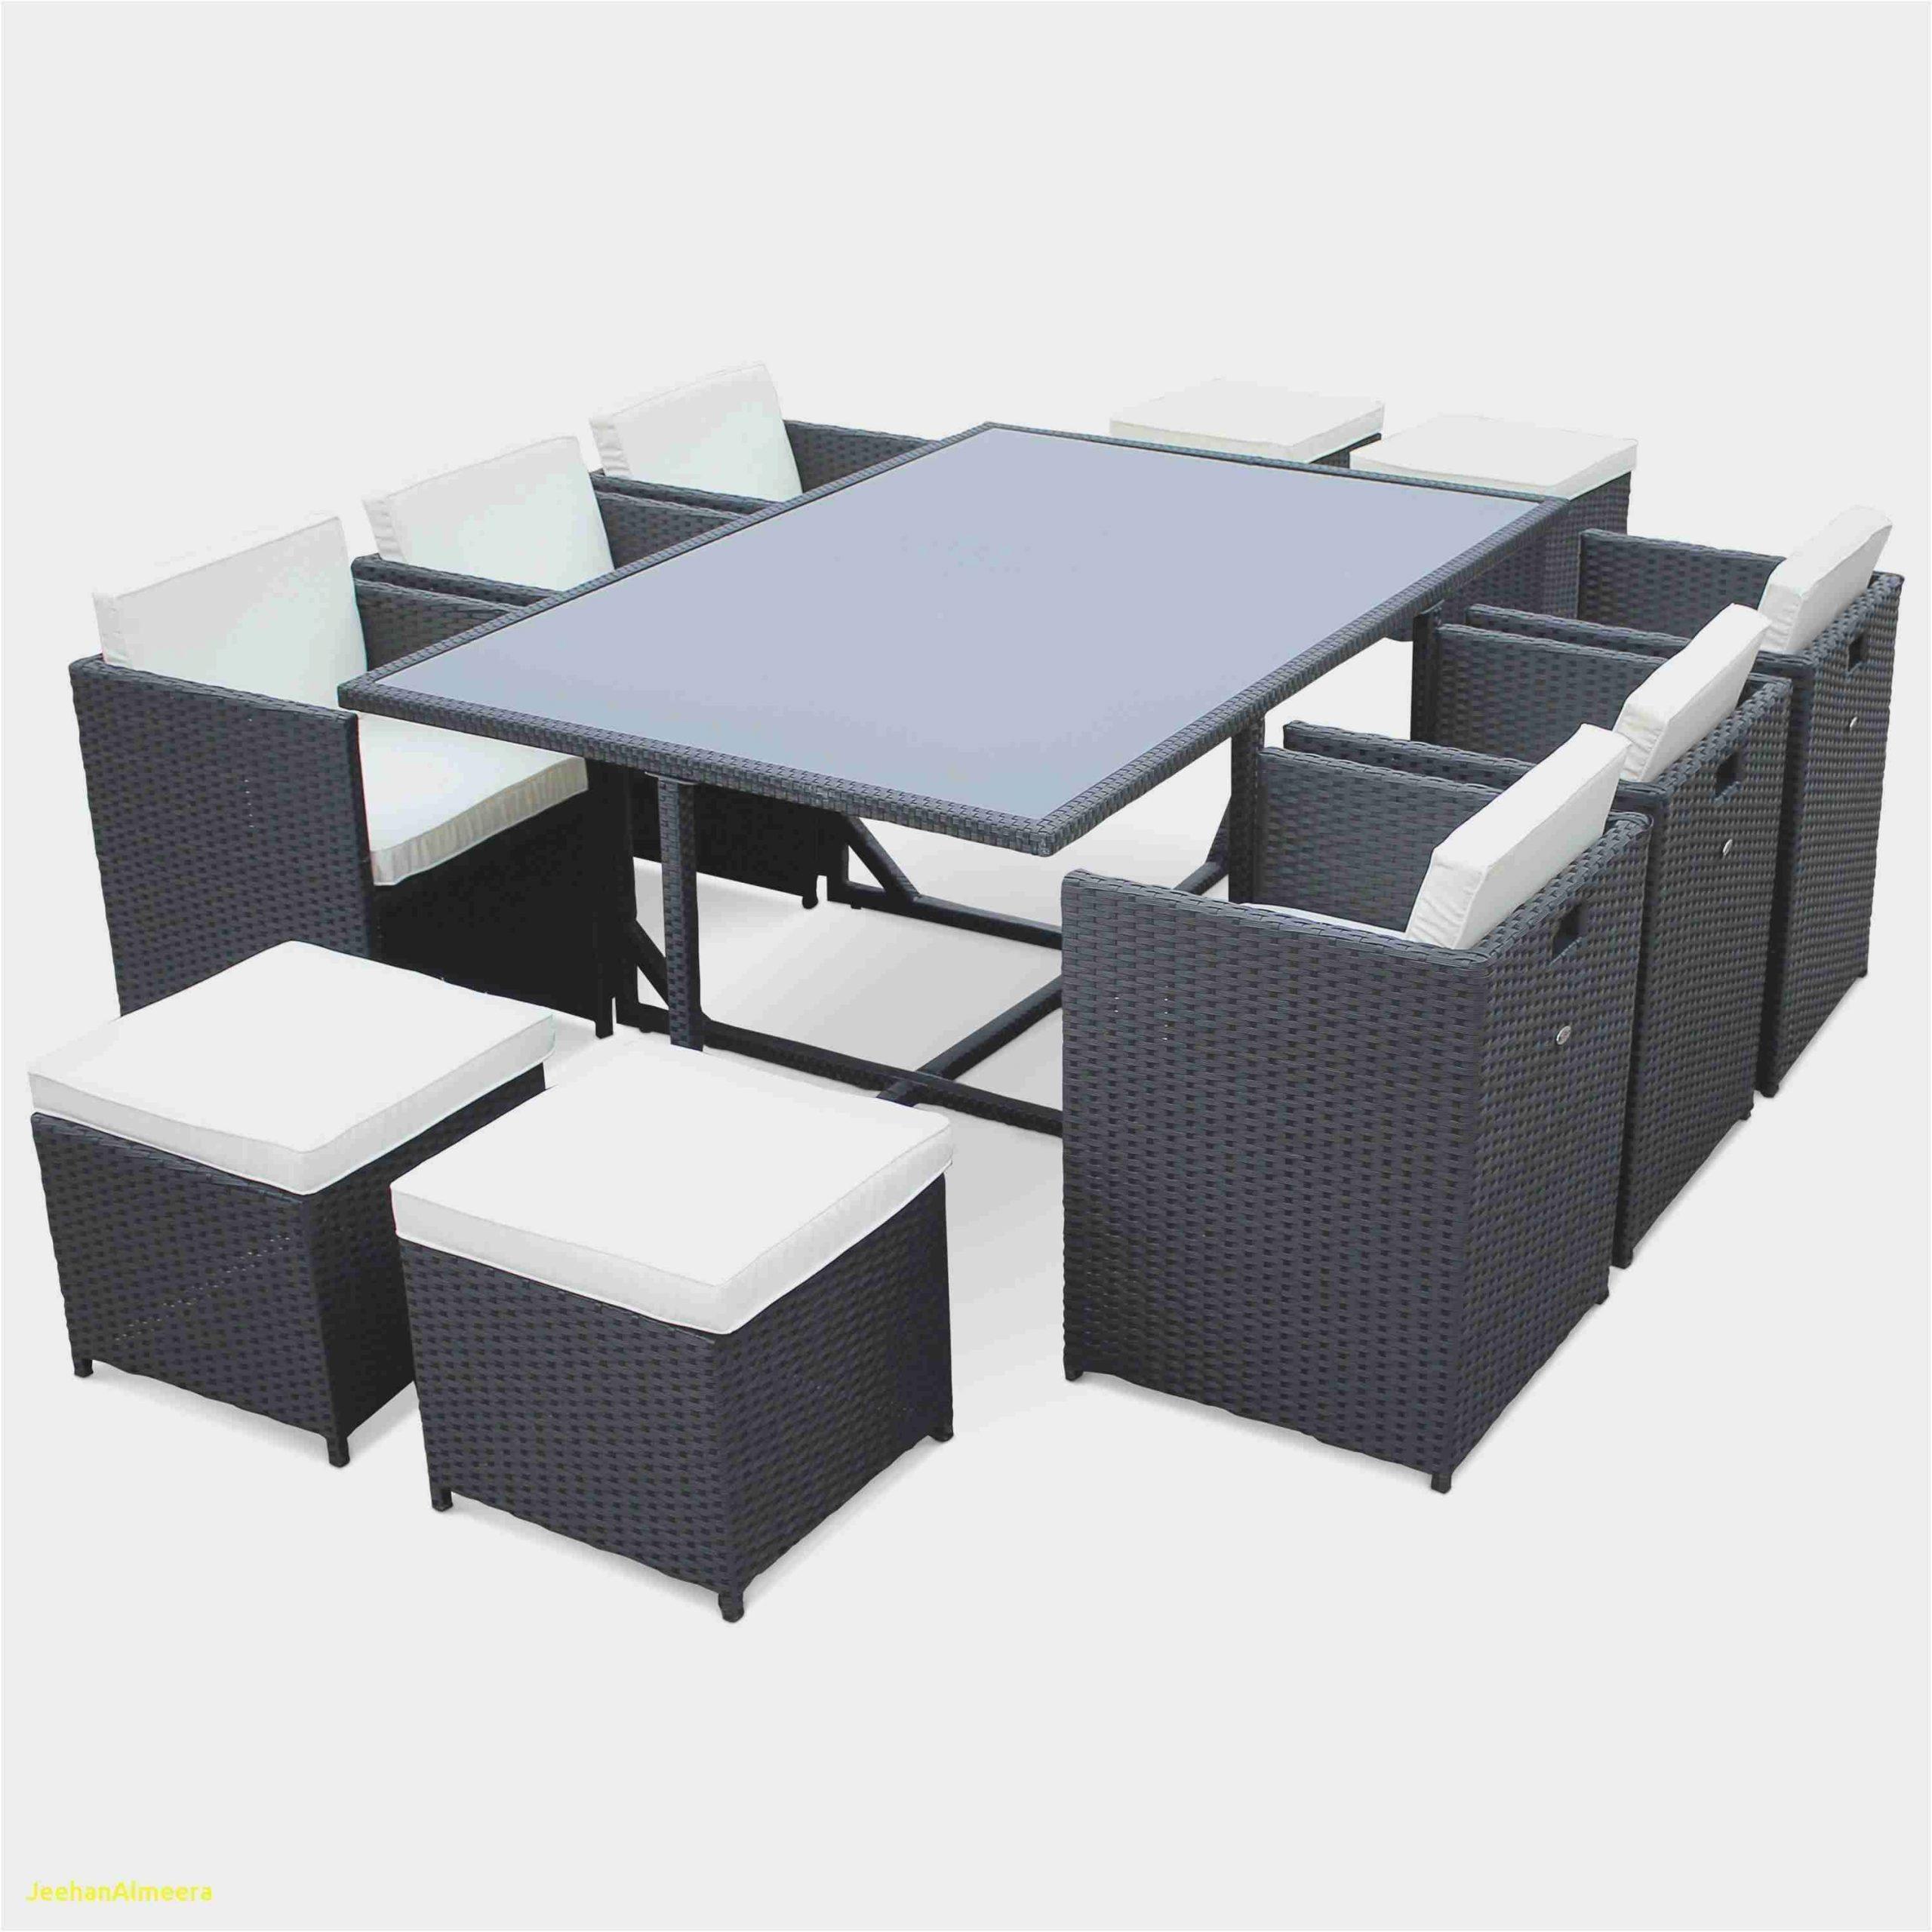 Gifi Table Basse Nice Table Basse Jardin Gifi S ... tout Salon De Jardin But